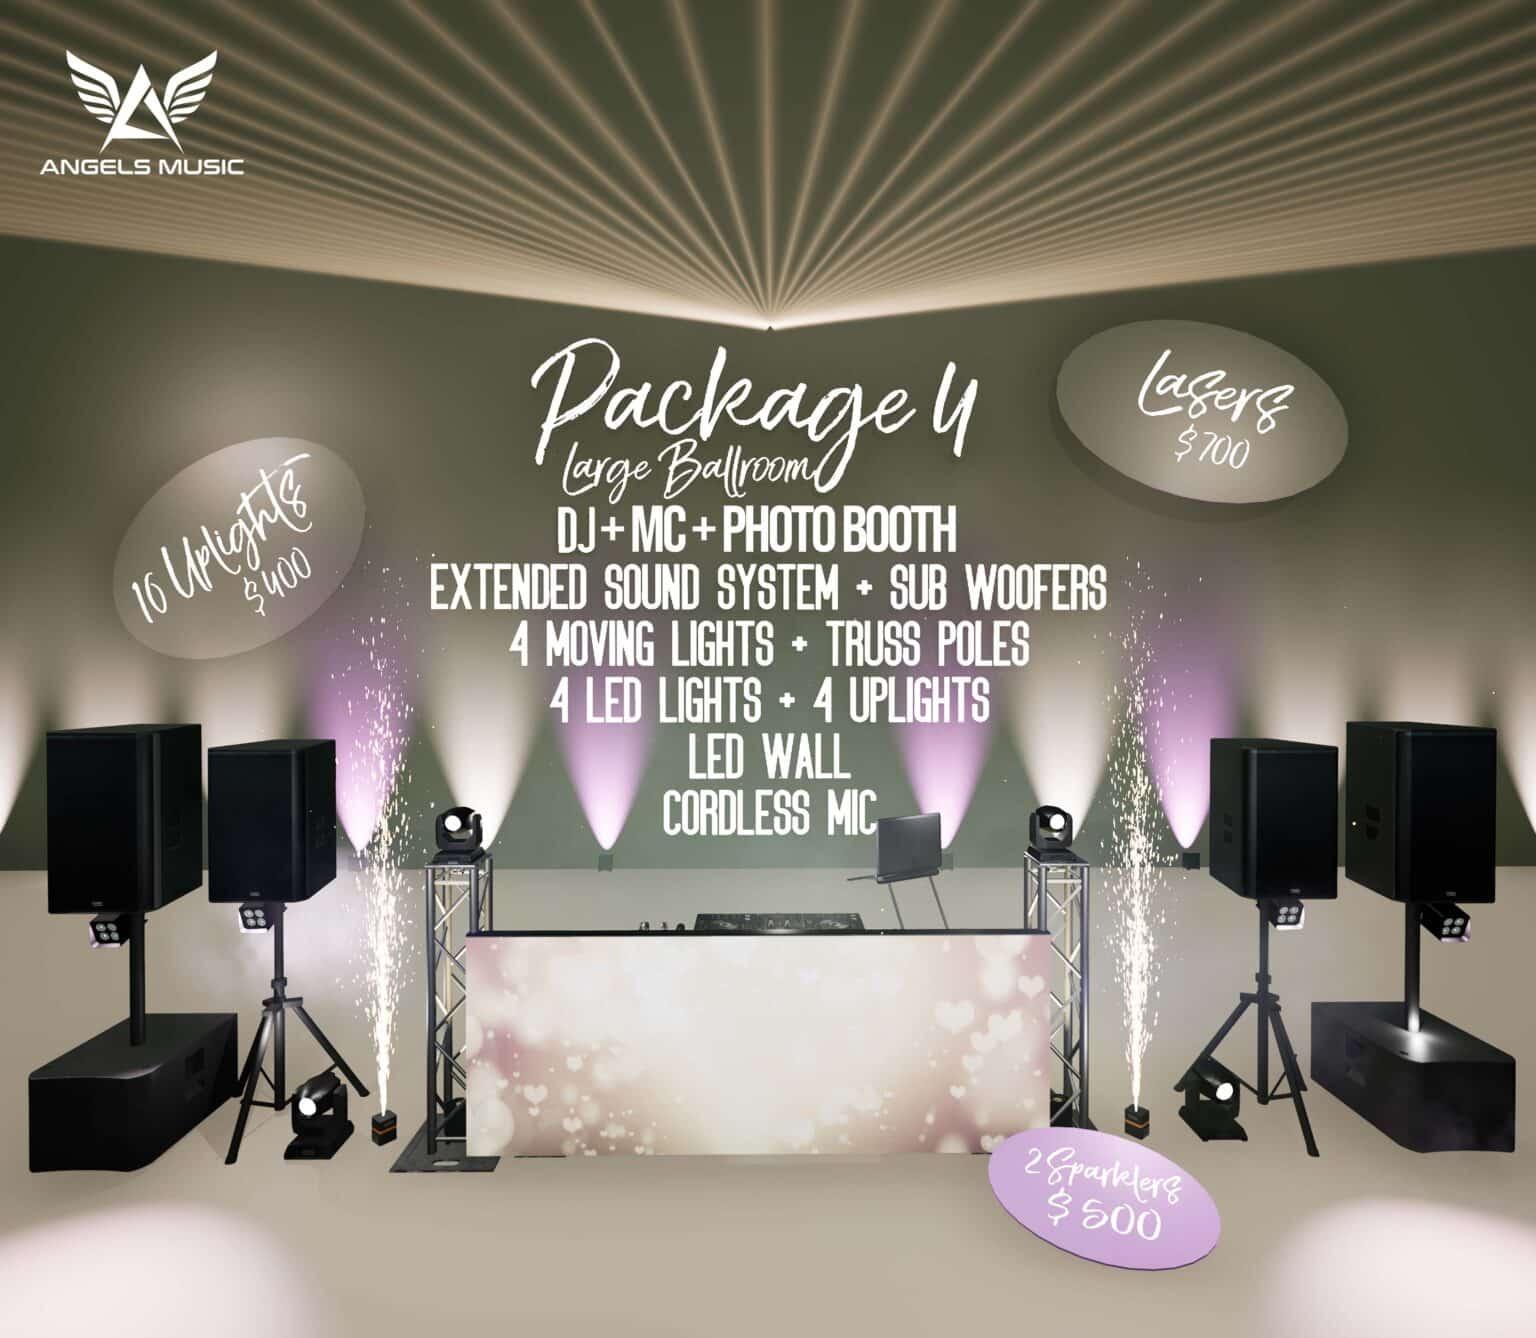 Best DJ Package, DJ Prices, wedding dj package, birthday dj package, bar mitzvah dj package, wedding dj price,